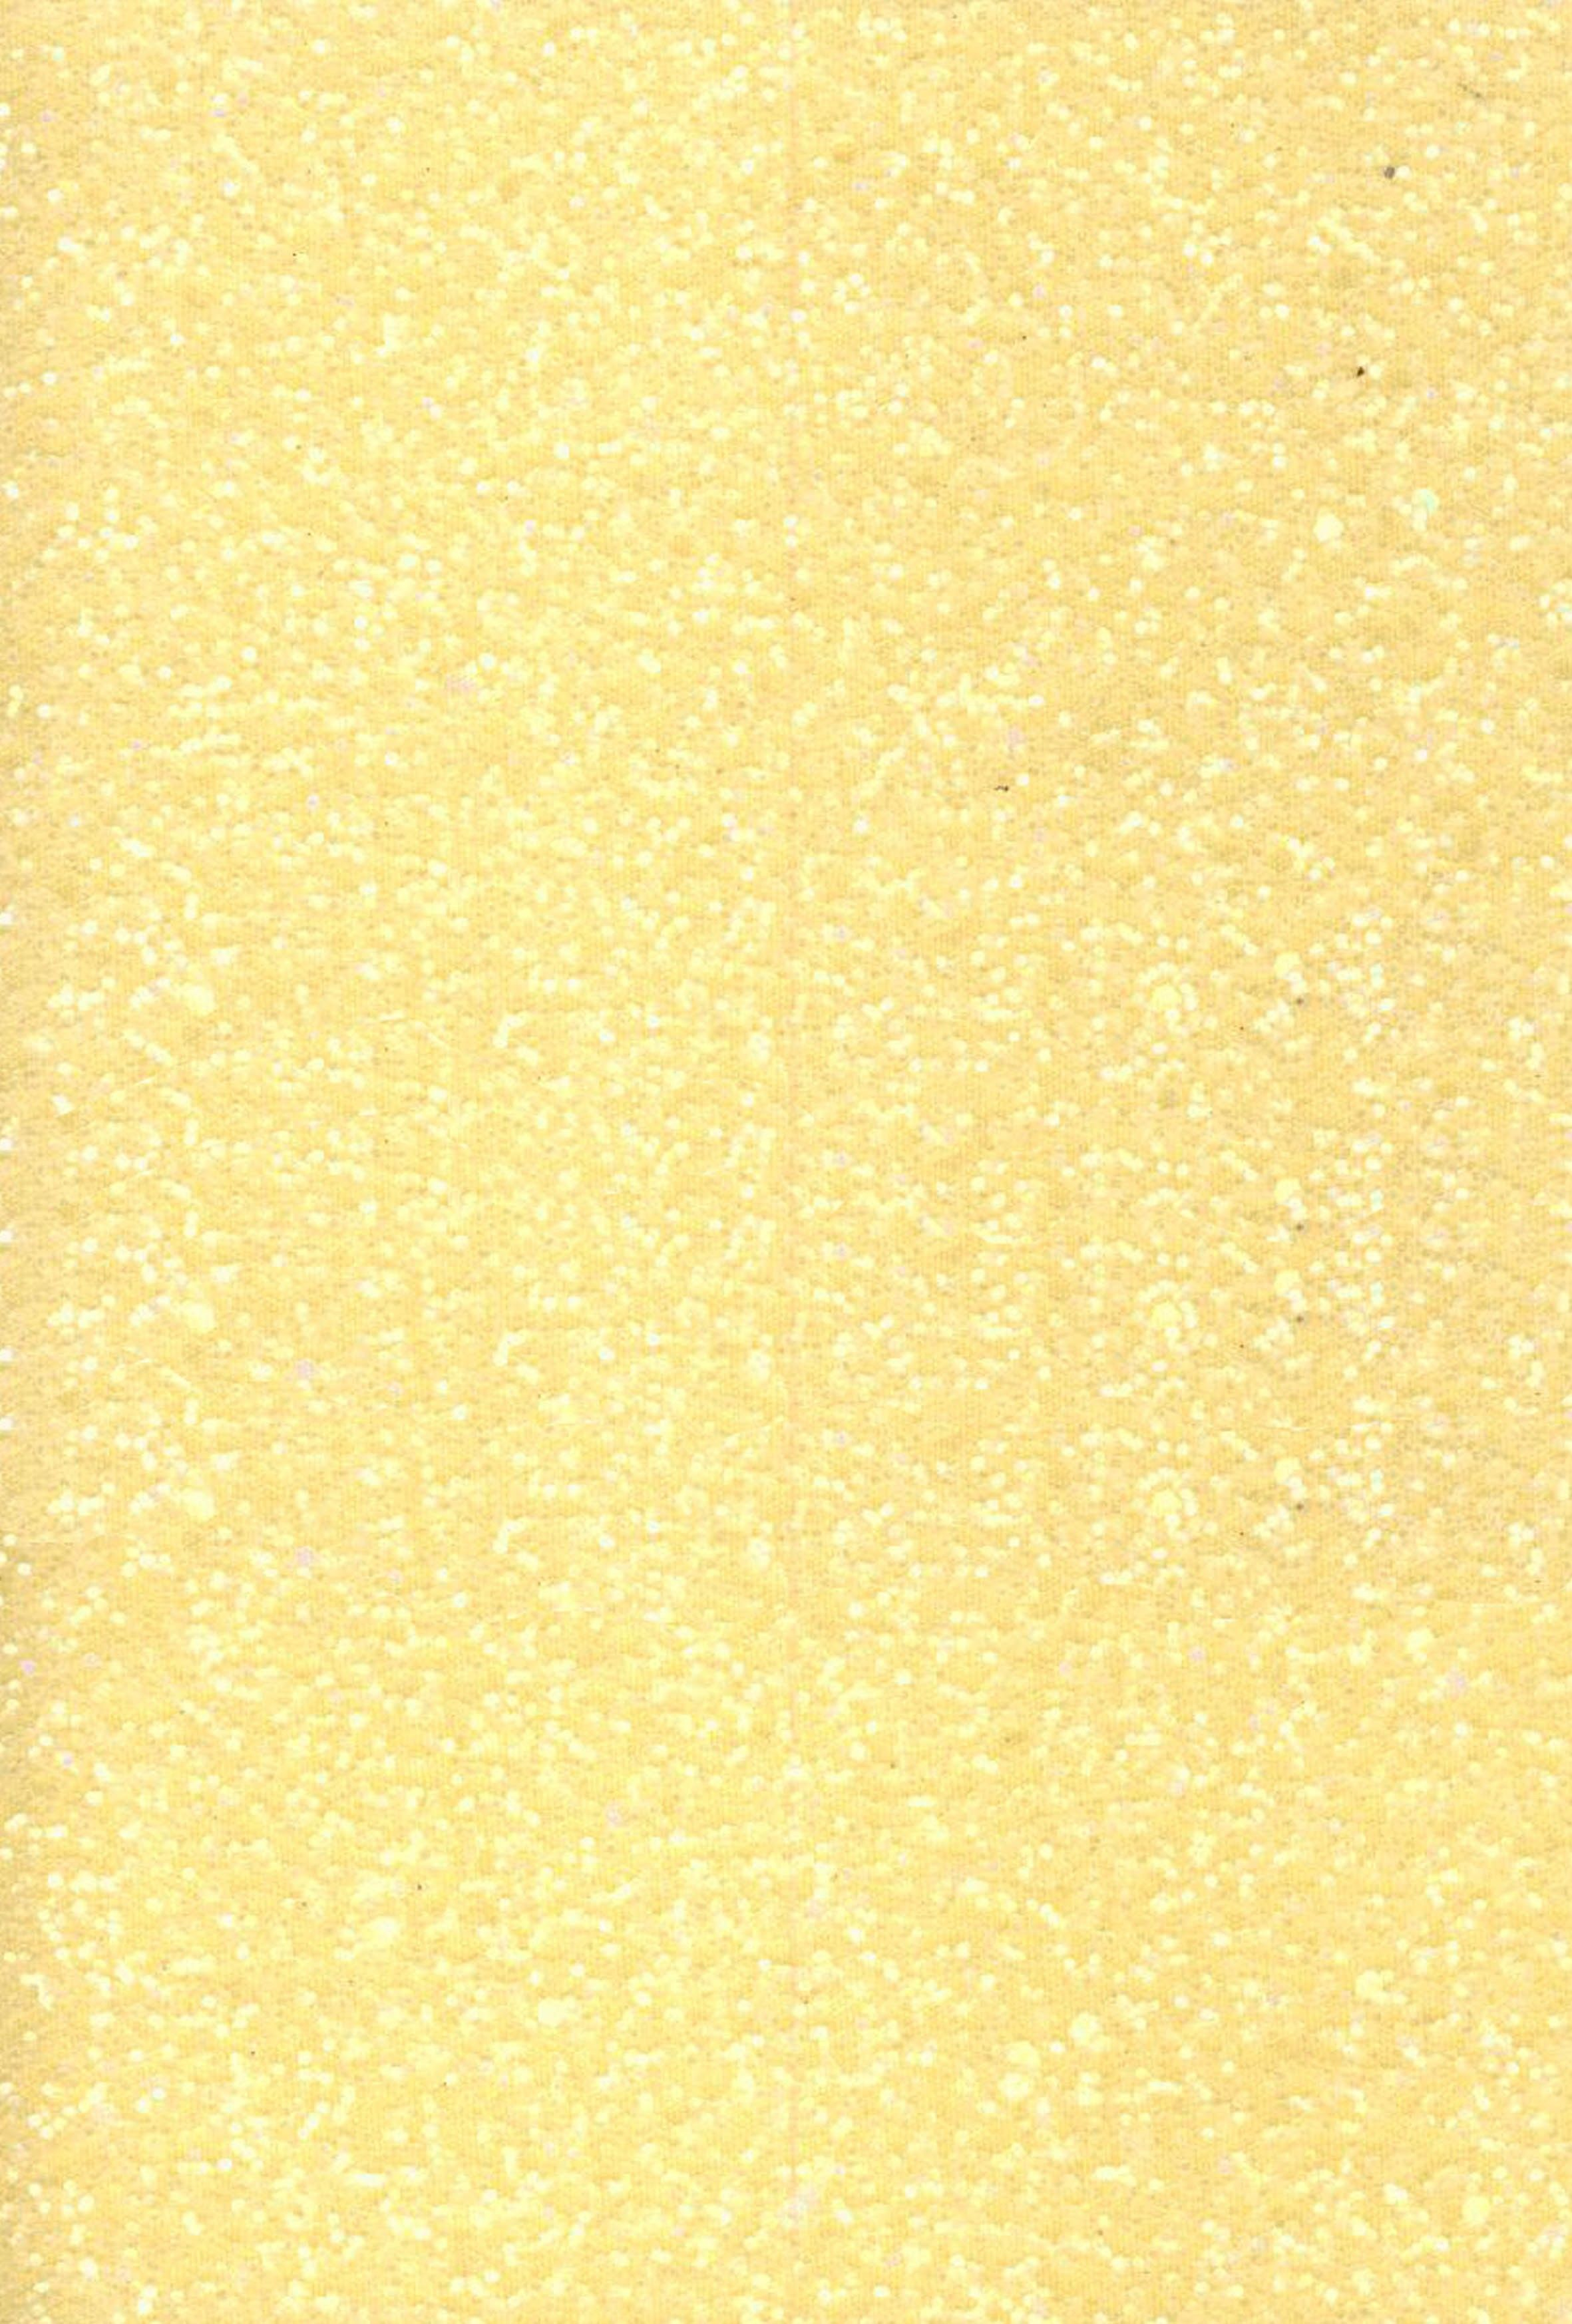 yellow glitter wallpaper | My Style | Pinterest | Glitter ...